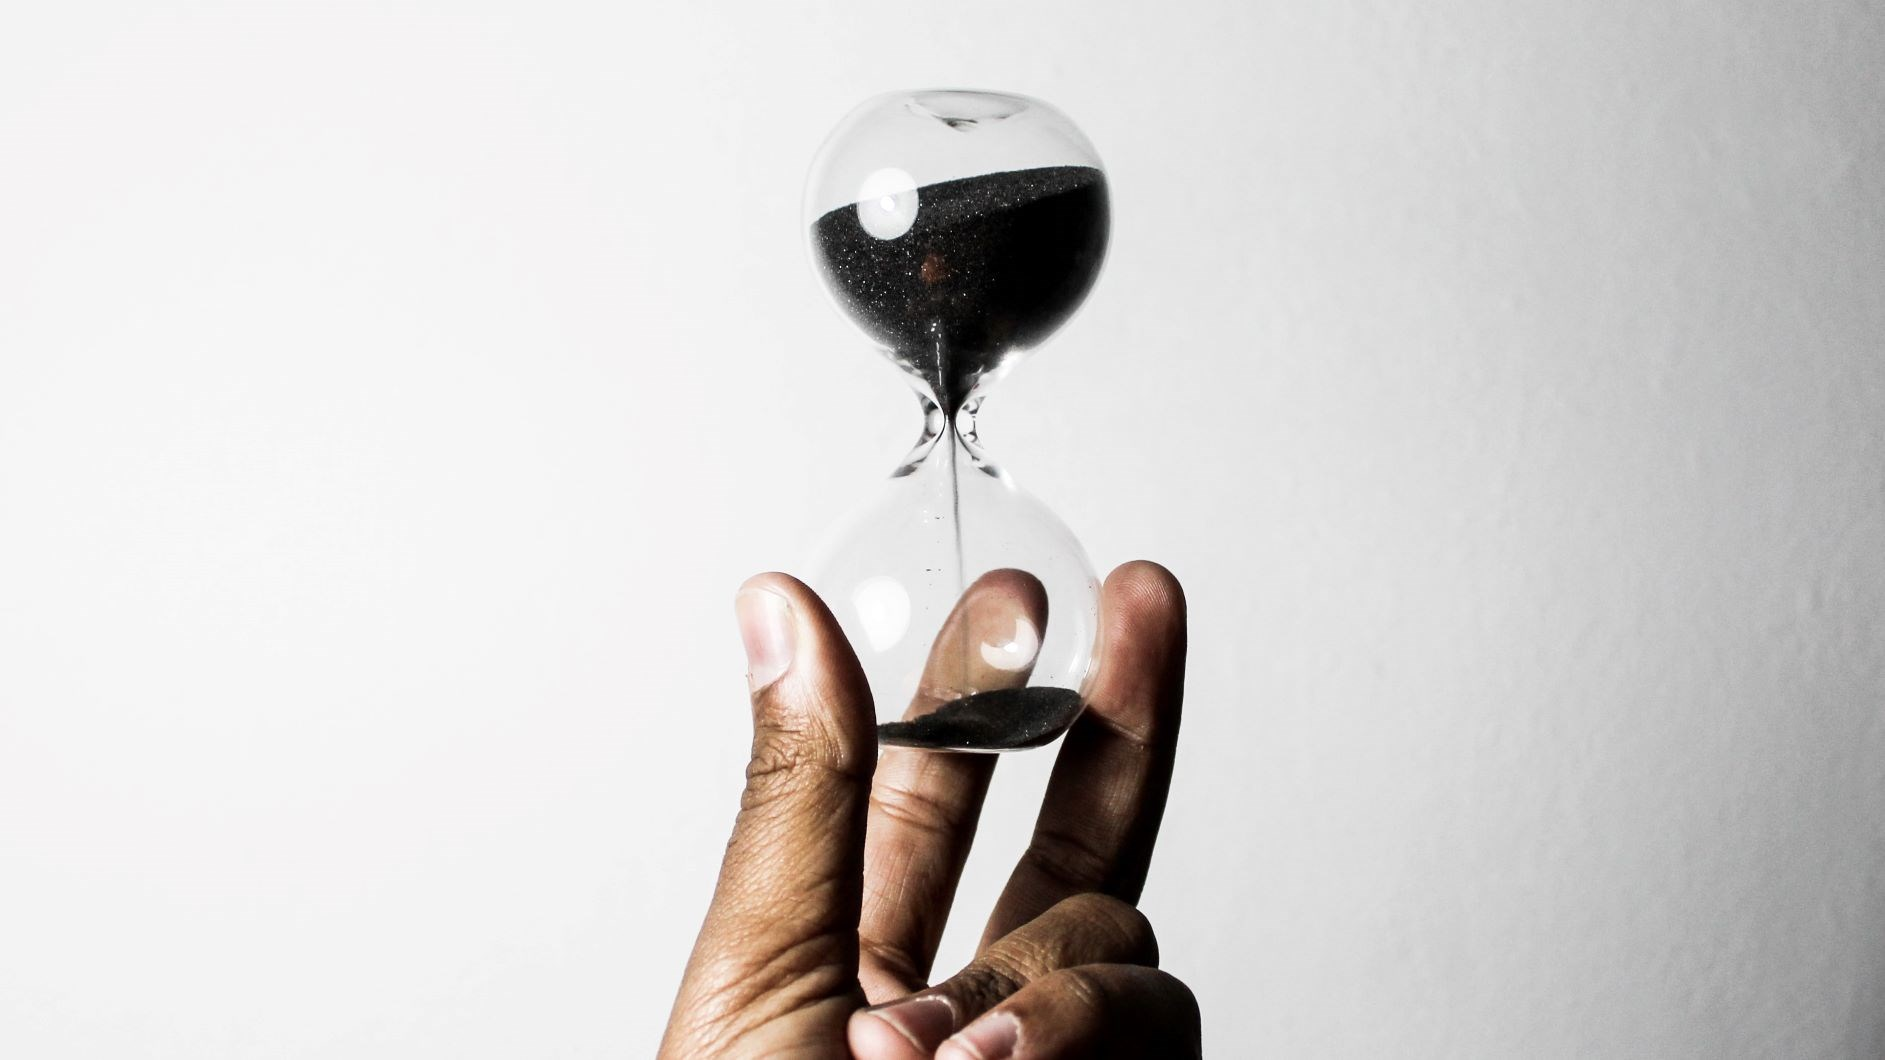 Hourglass in Hand